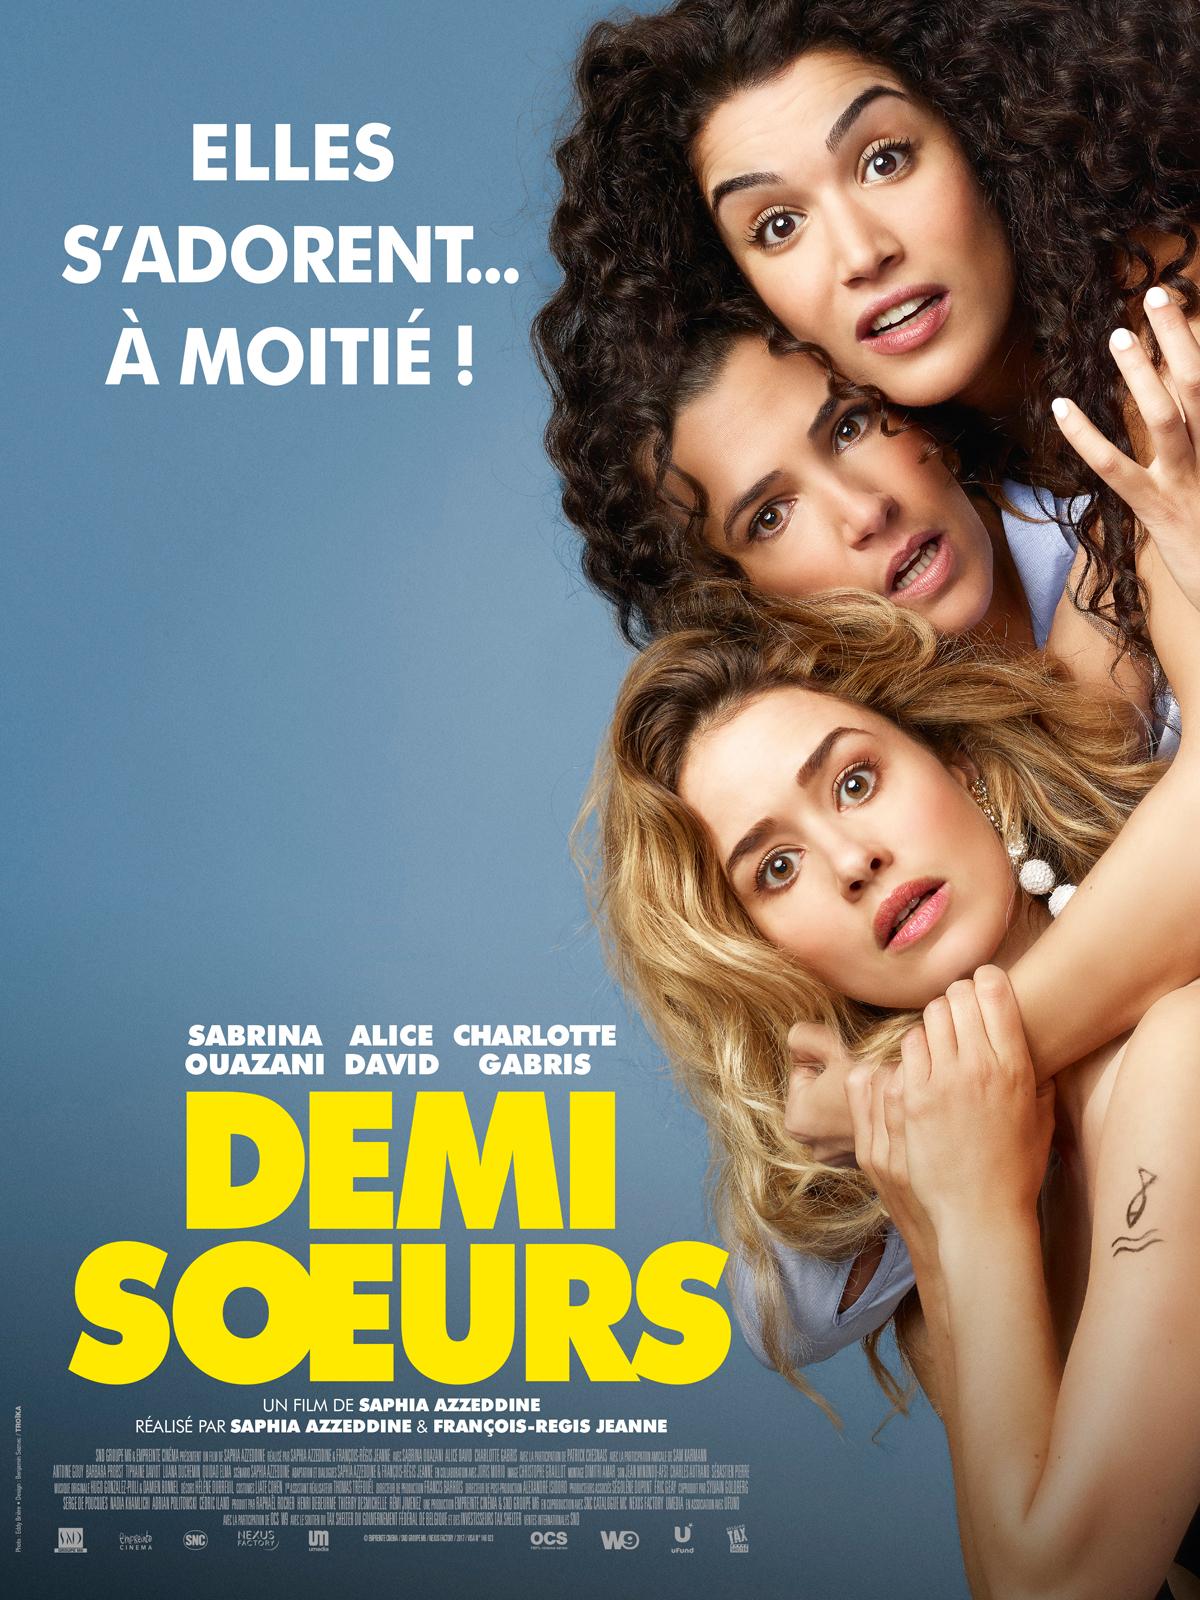 Demi-sœurs Streaming : demi-sœurs, streaming, Demi-sœurs, Streaming, Complet, Francais